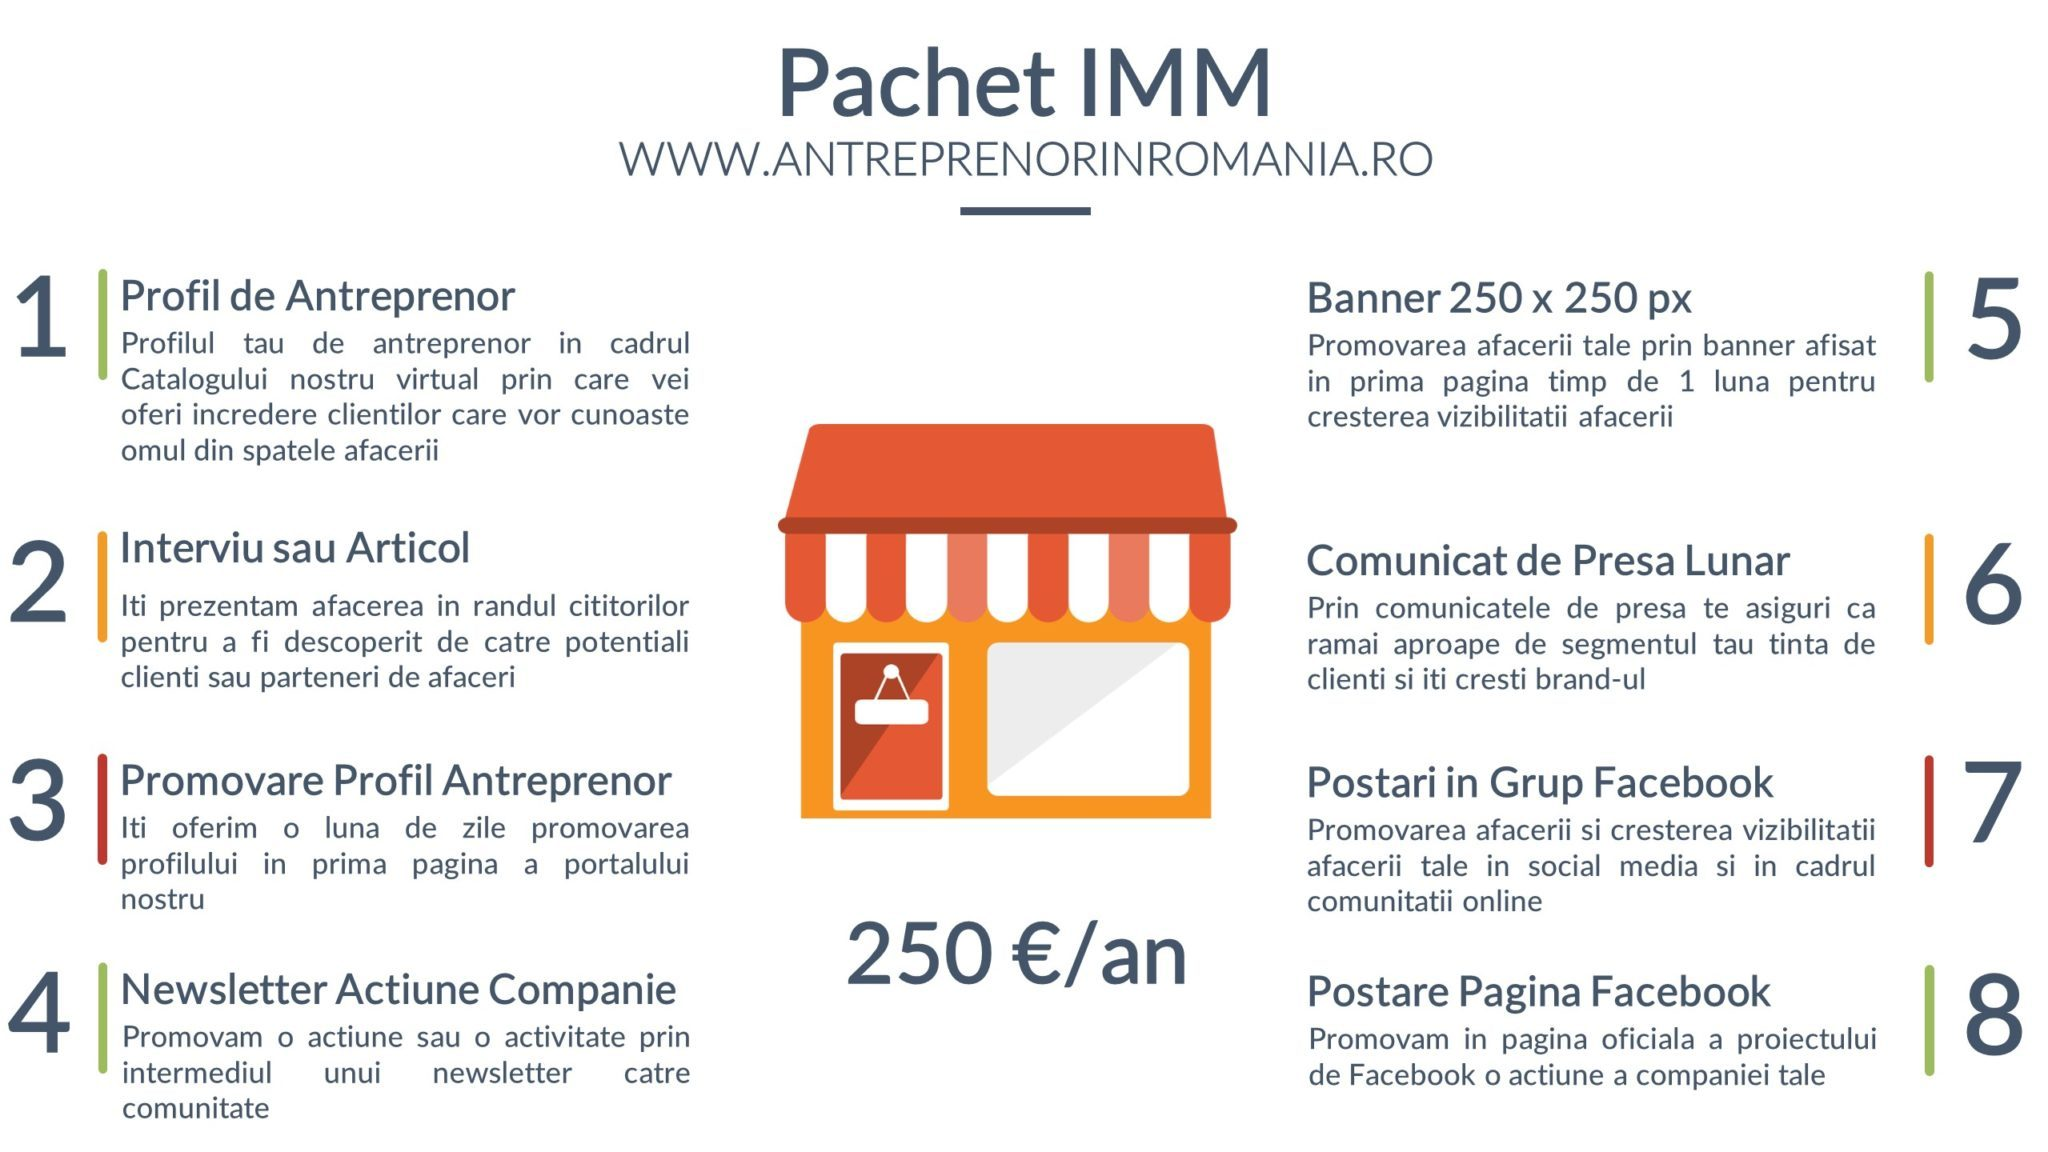 Pachet IMM promovare firme, companii, startups